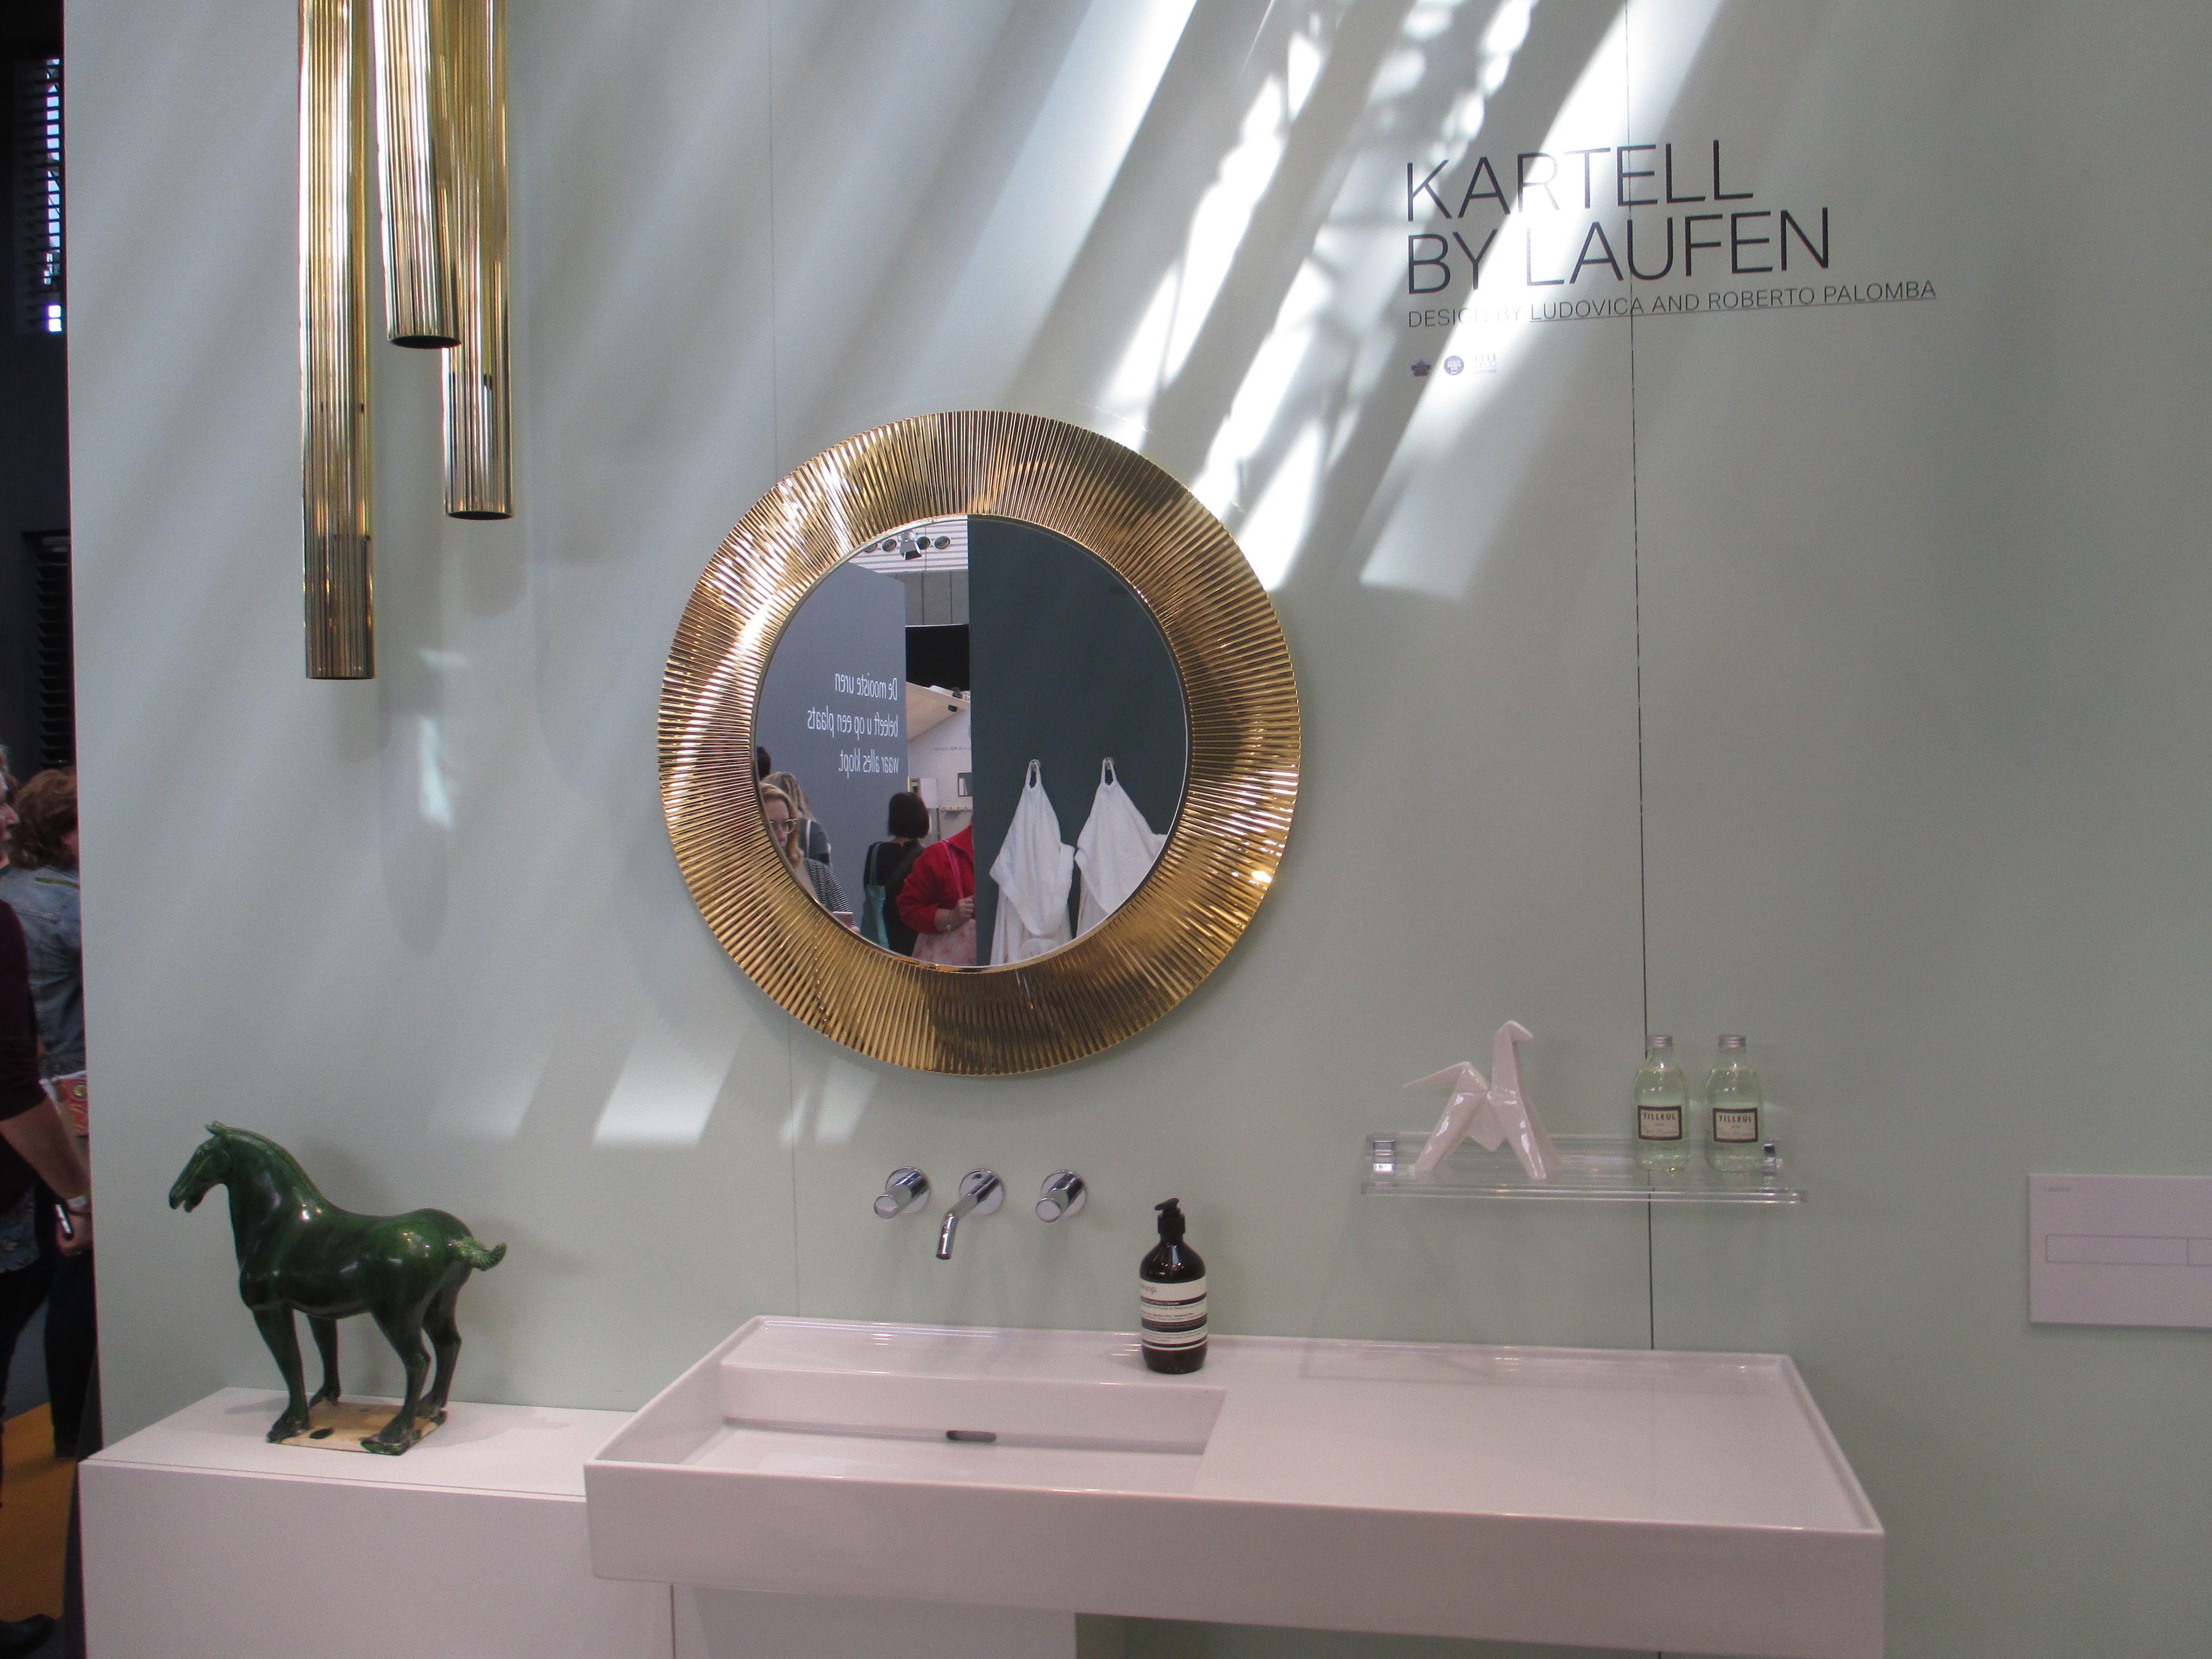 Ronde Spiegel Badkamer : Wandmontage luxe sanitair badkamer bad ronde spiegel kabinet